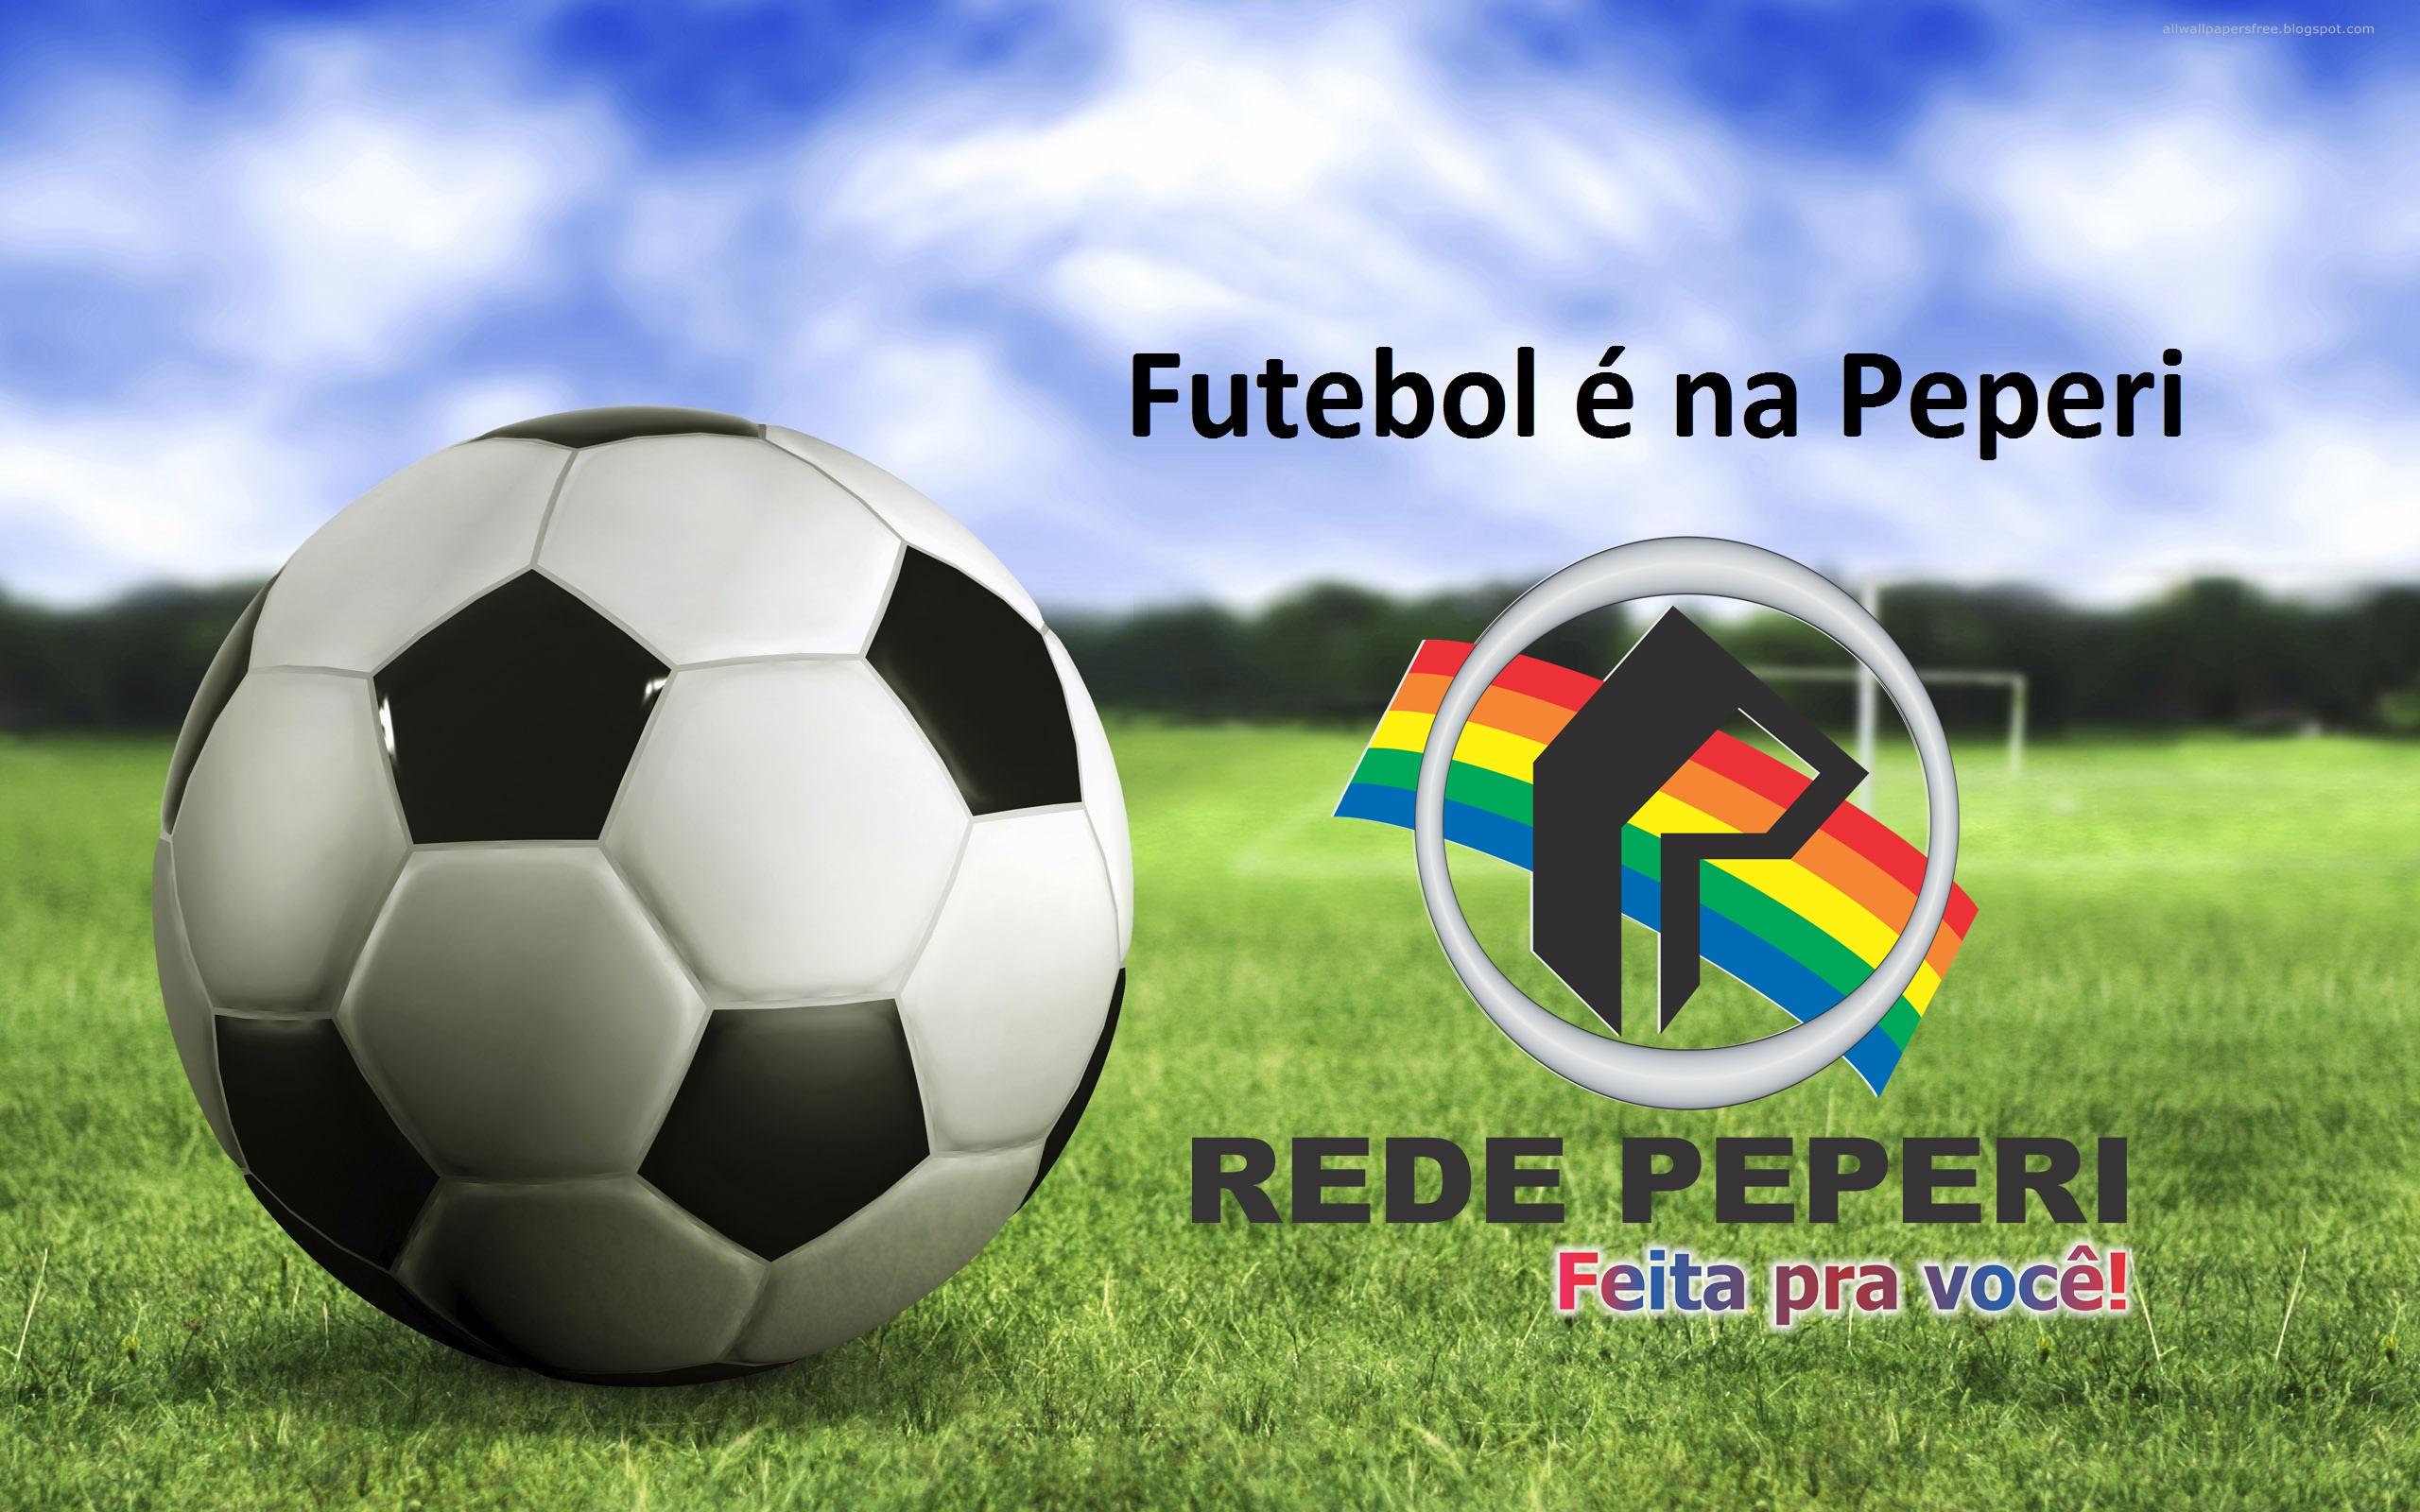 Peperi transmite semifinal do Campeonato Municipal de Futebol